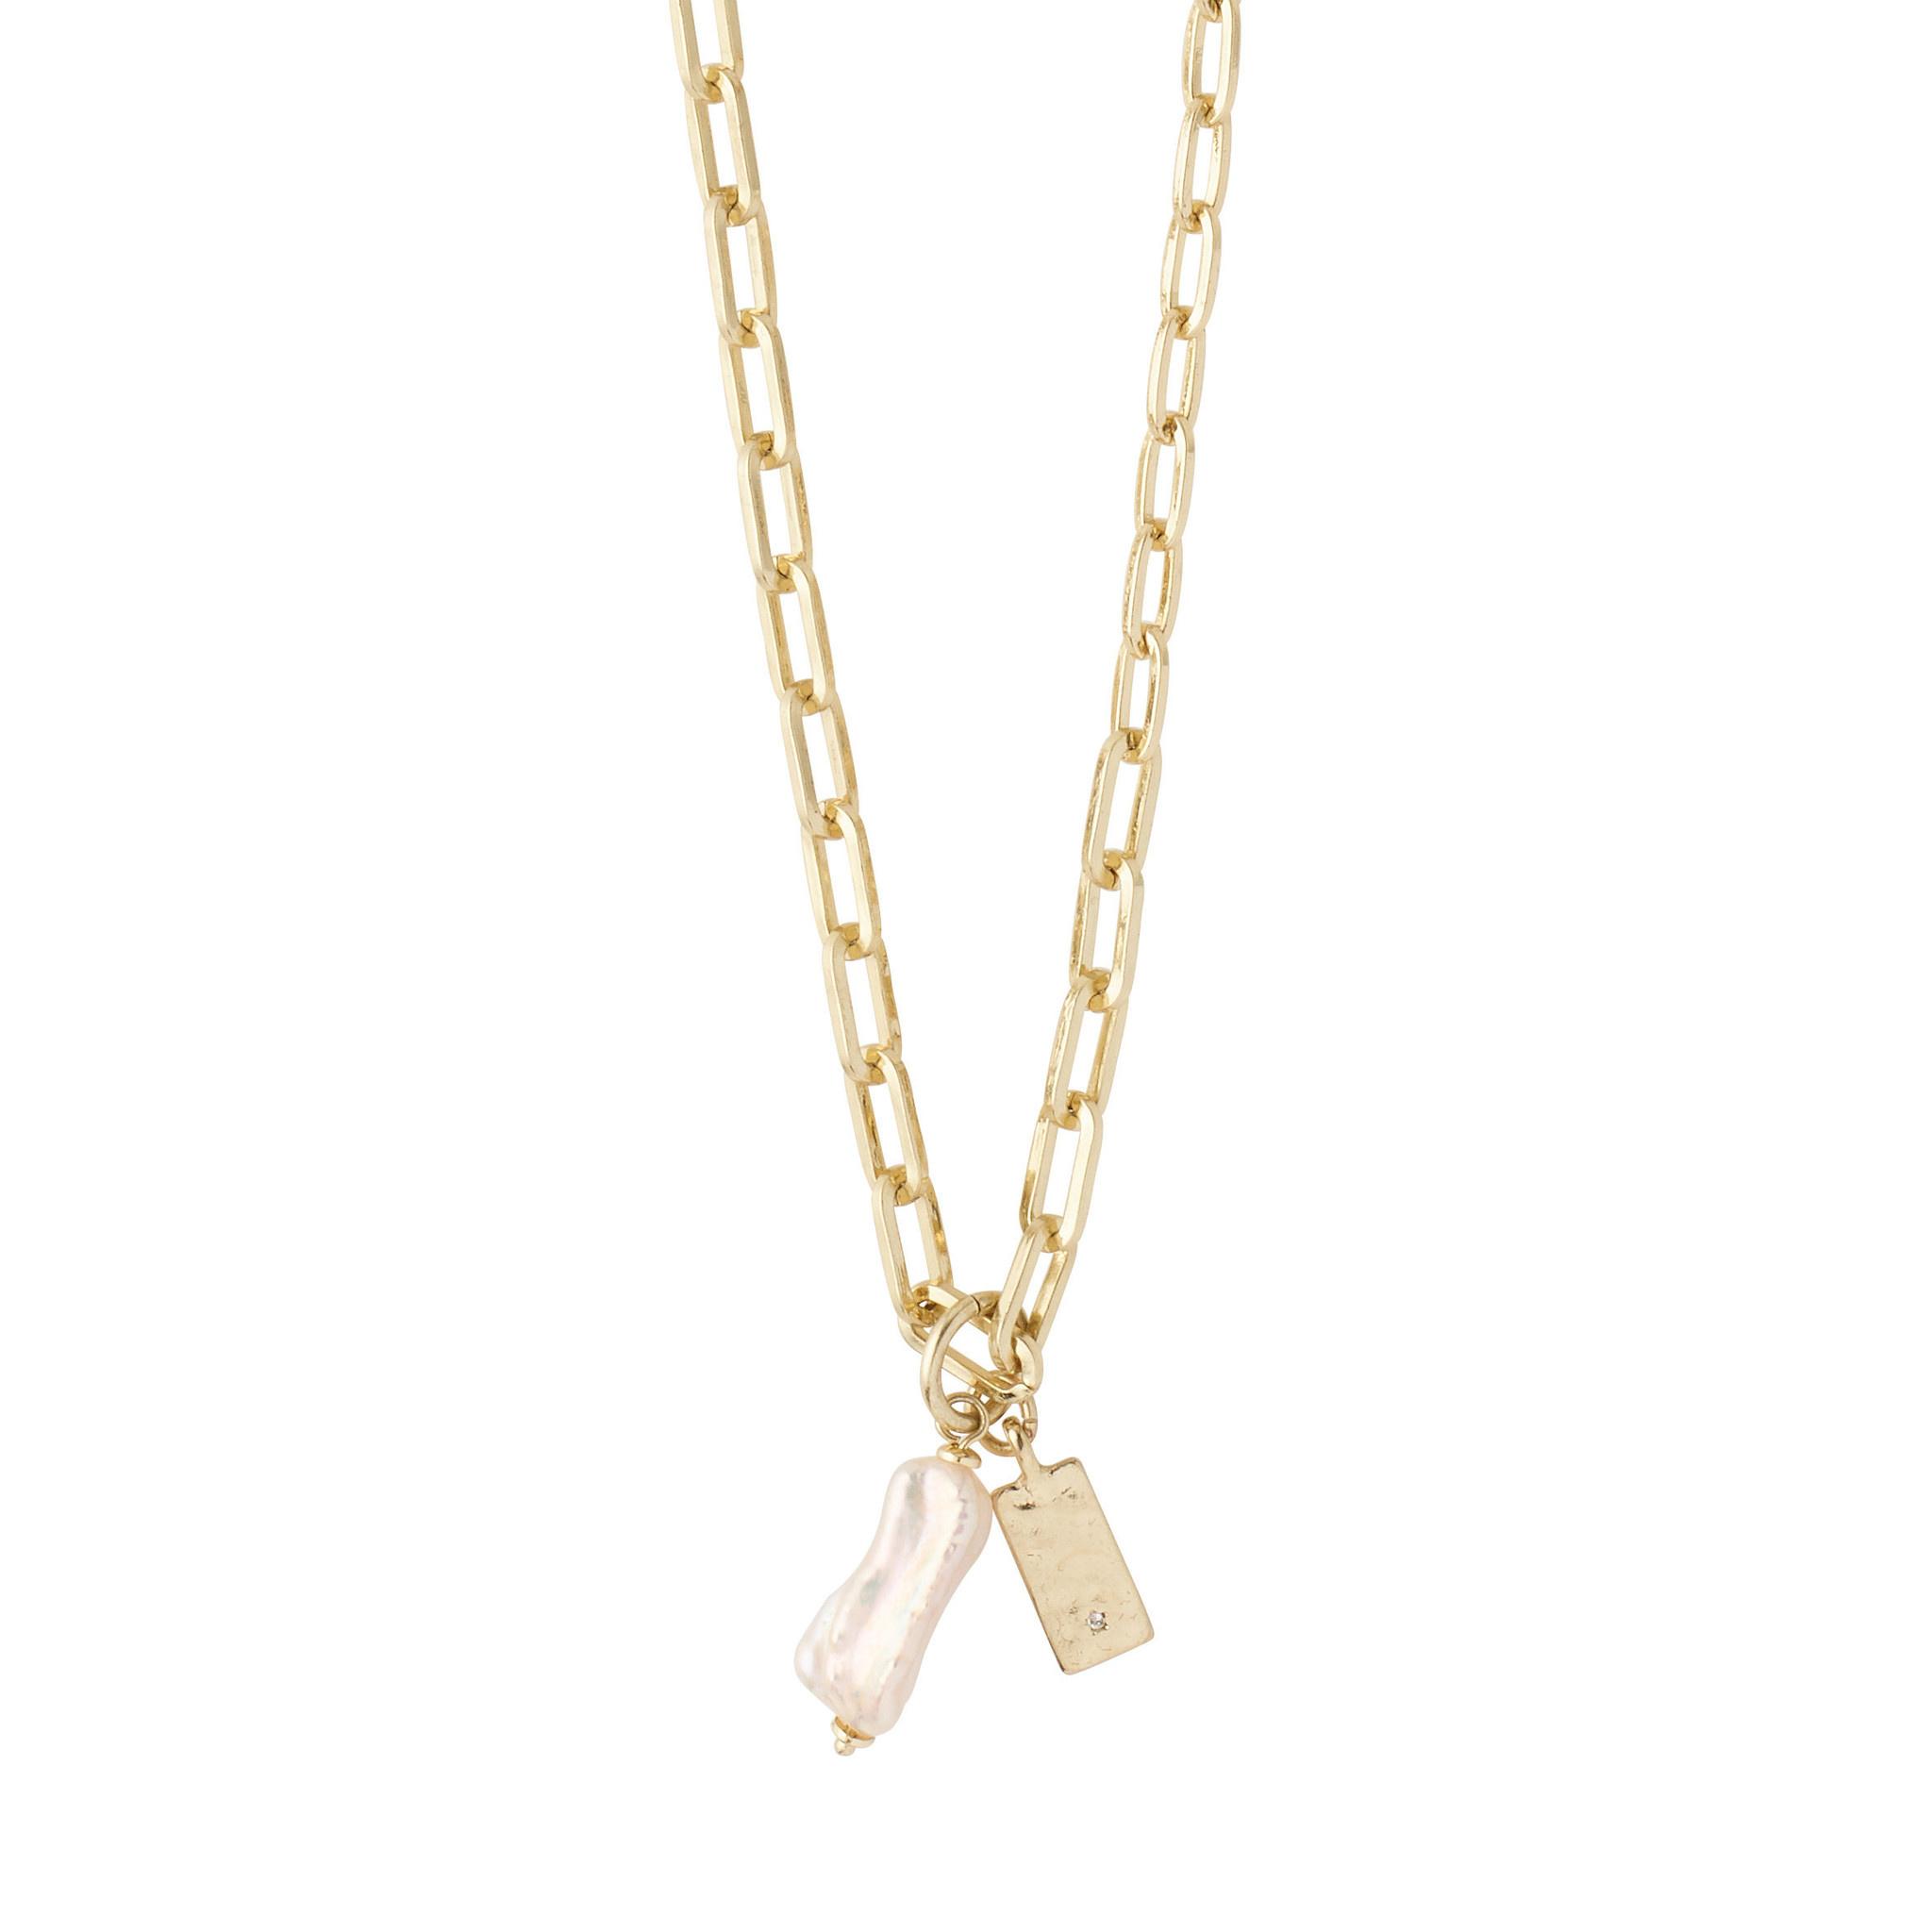 Pilgrim Necklace Enchantment Gold Plated White - 112122011